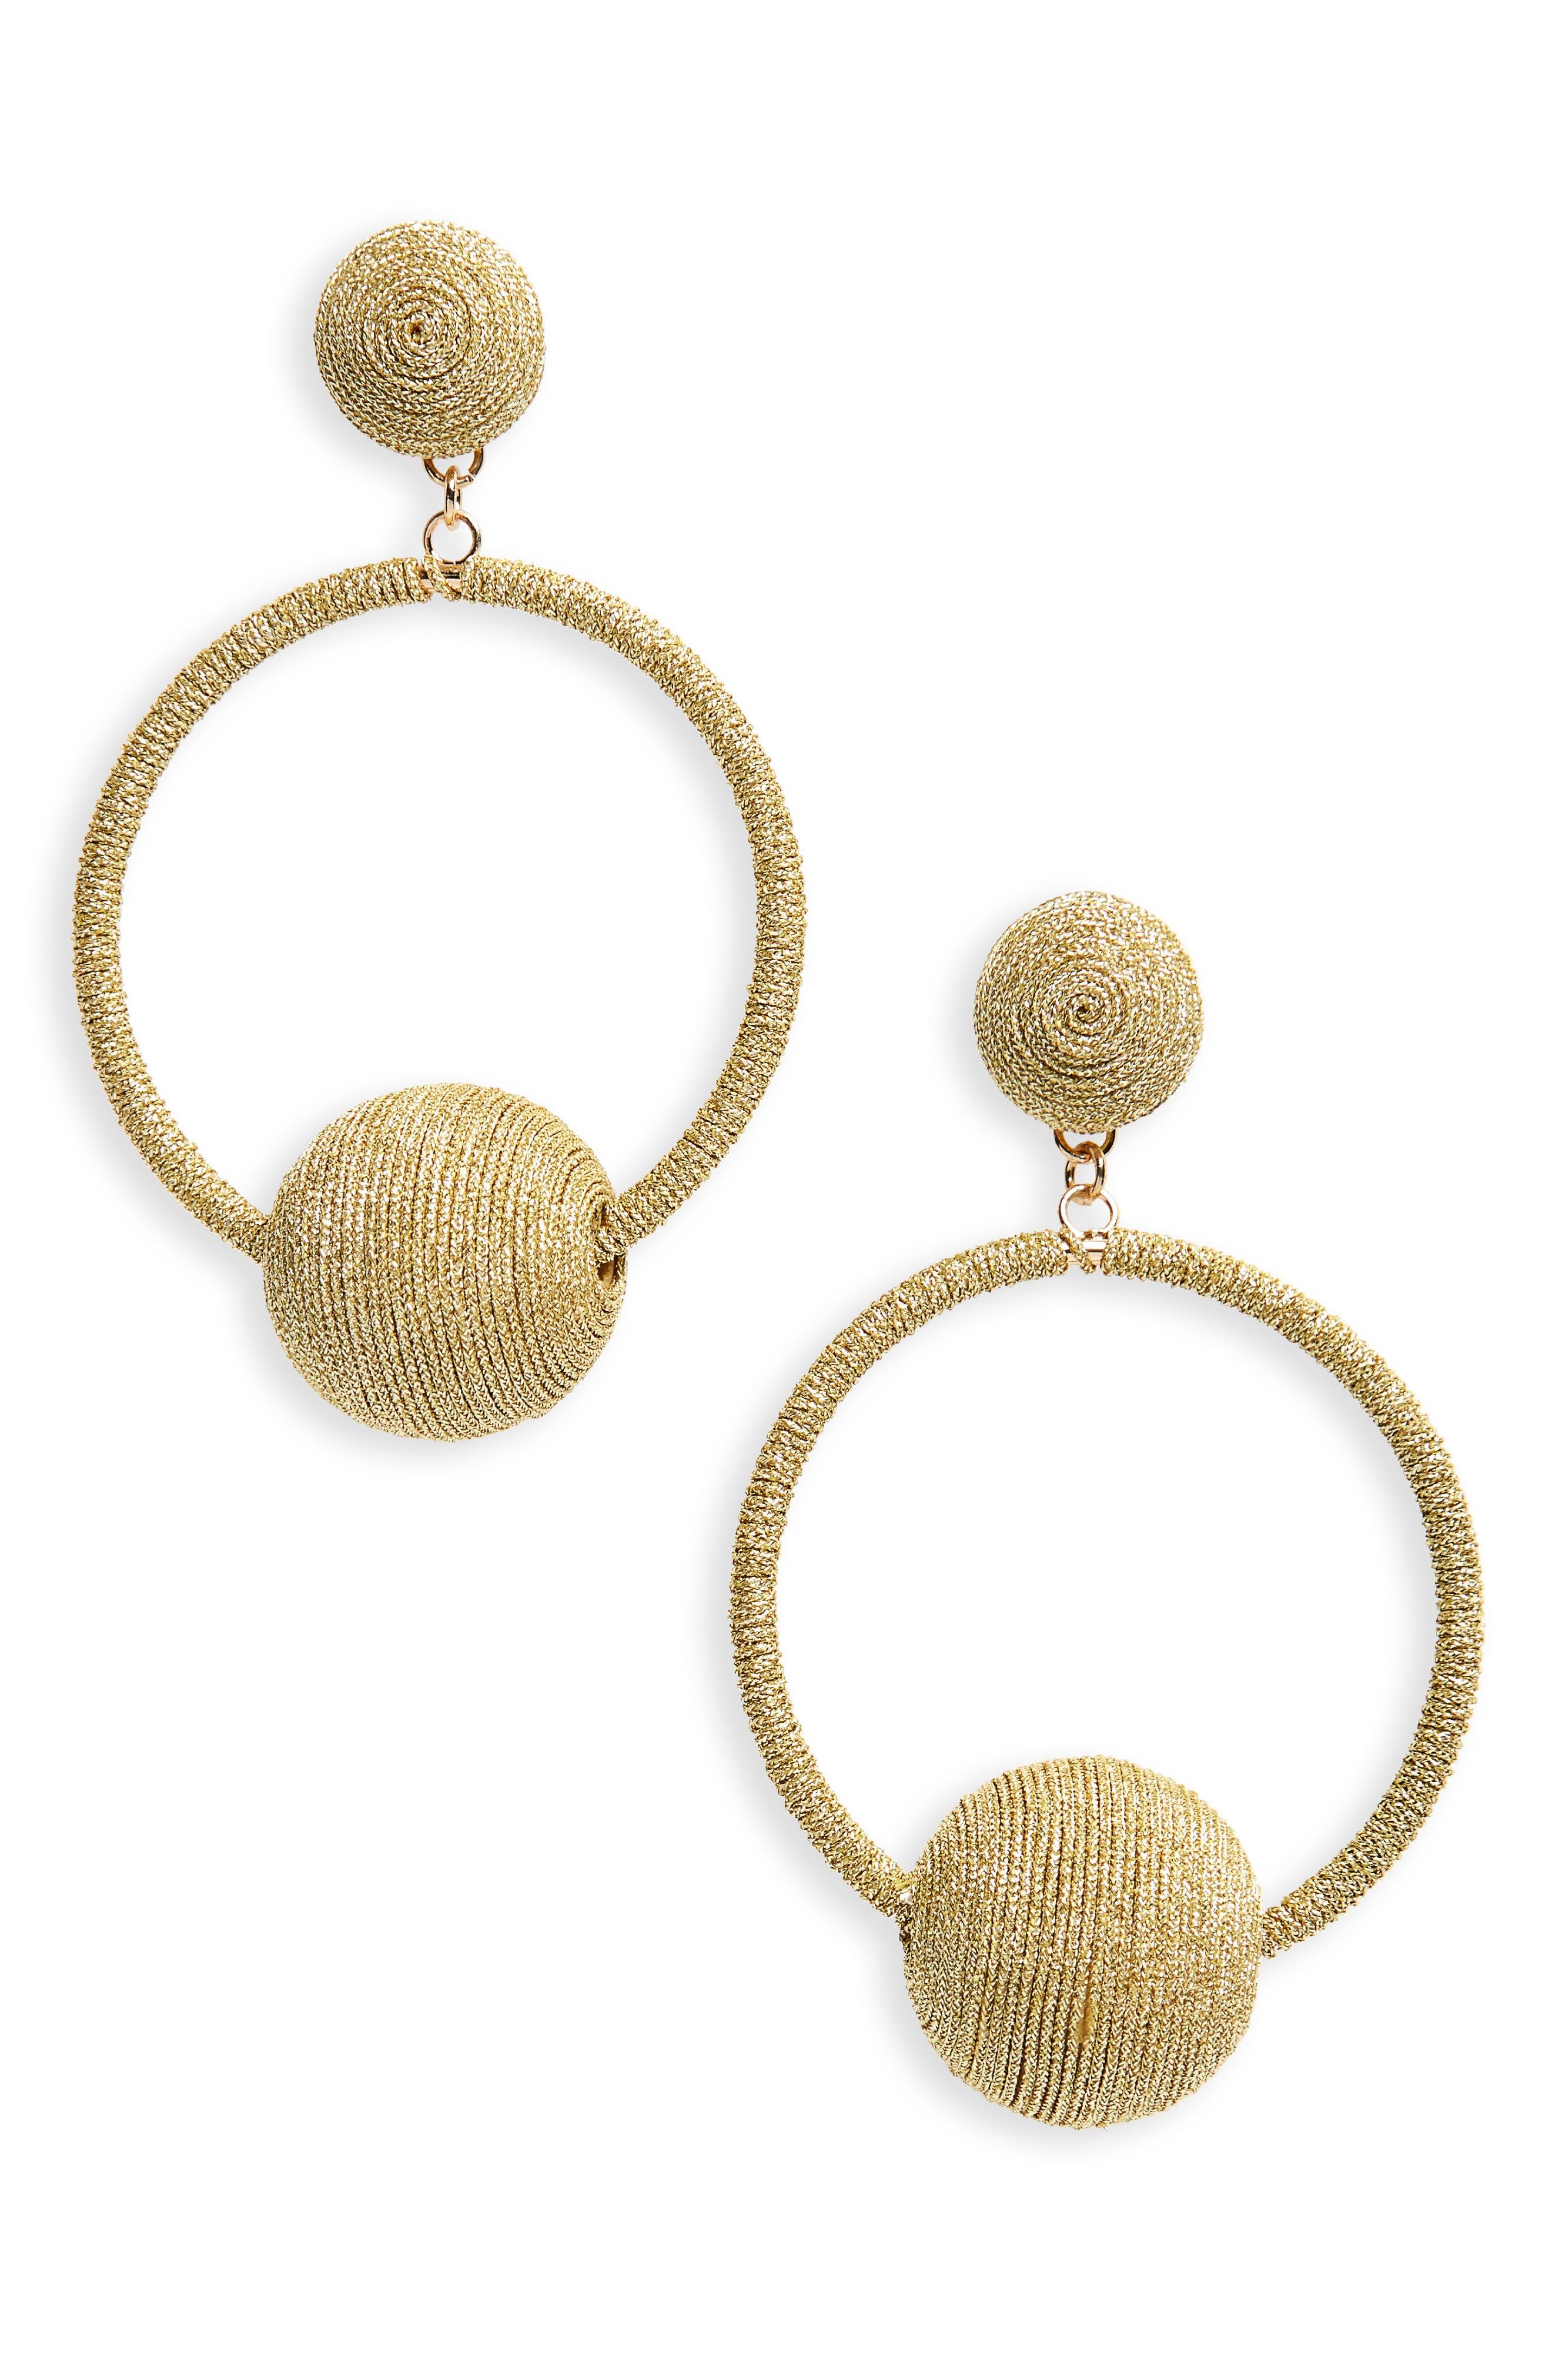 Main Image - Kitsch Metallic Wrapped Drop Earrings